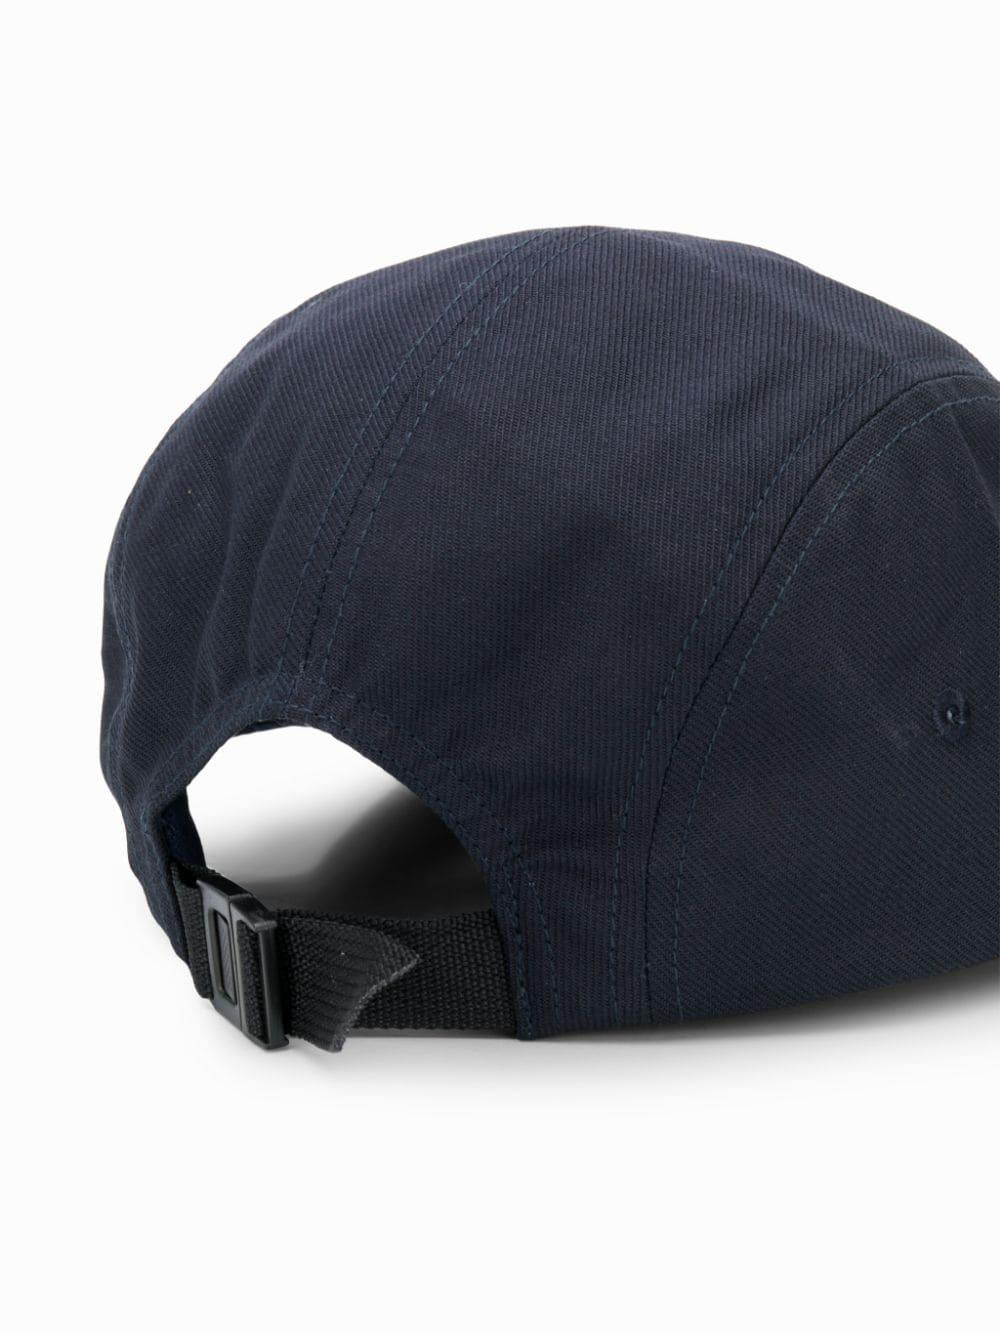 Fly Racing Plaid Hat Flat Brim Cap Flex Fit Hat Purple Black Yellow S//M